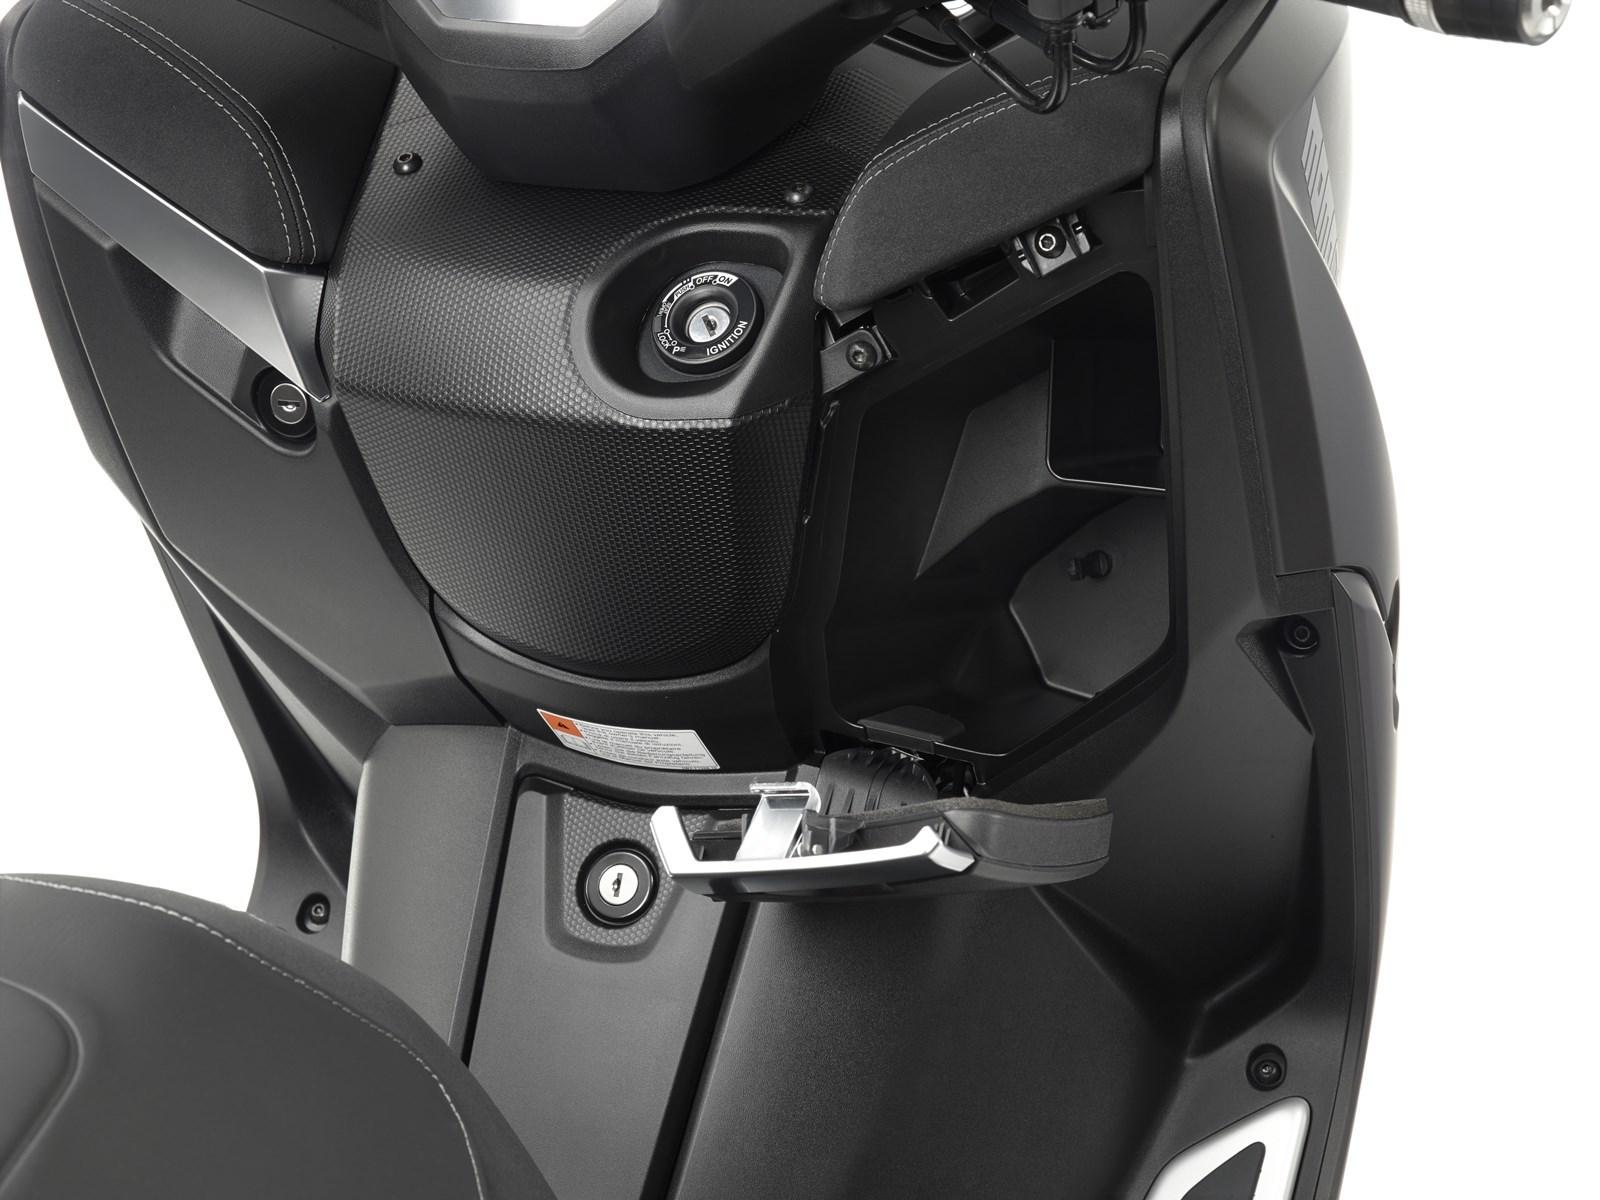 Foto de Yamaha X-MAX 400 MOMODESIGN, estudio y detalles (24/33)